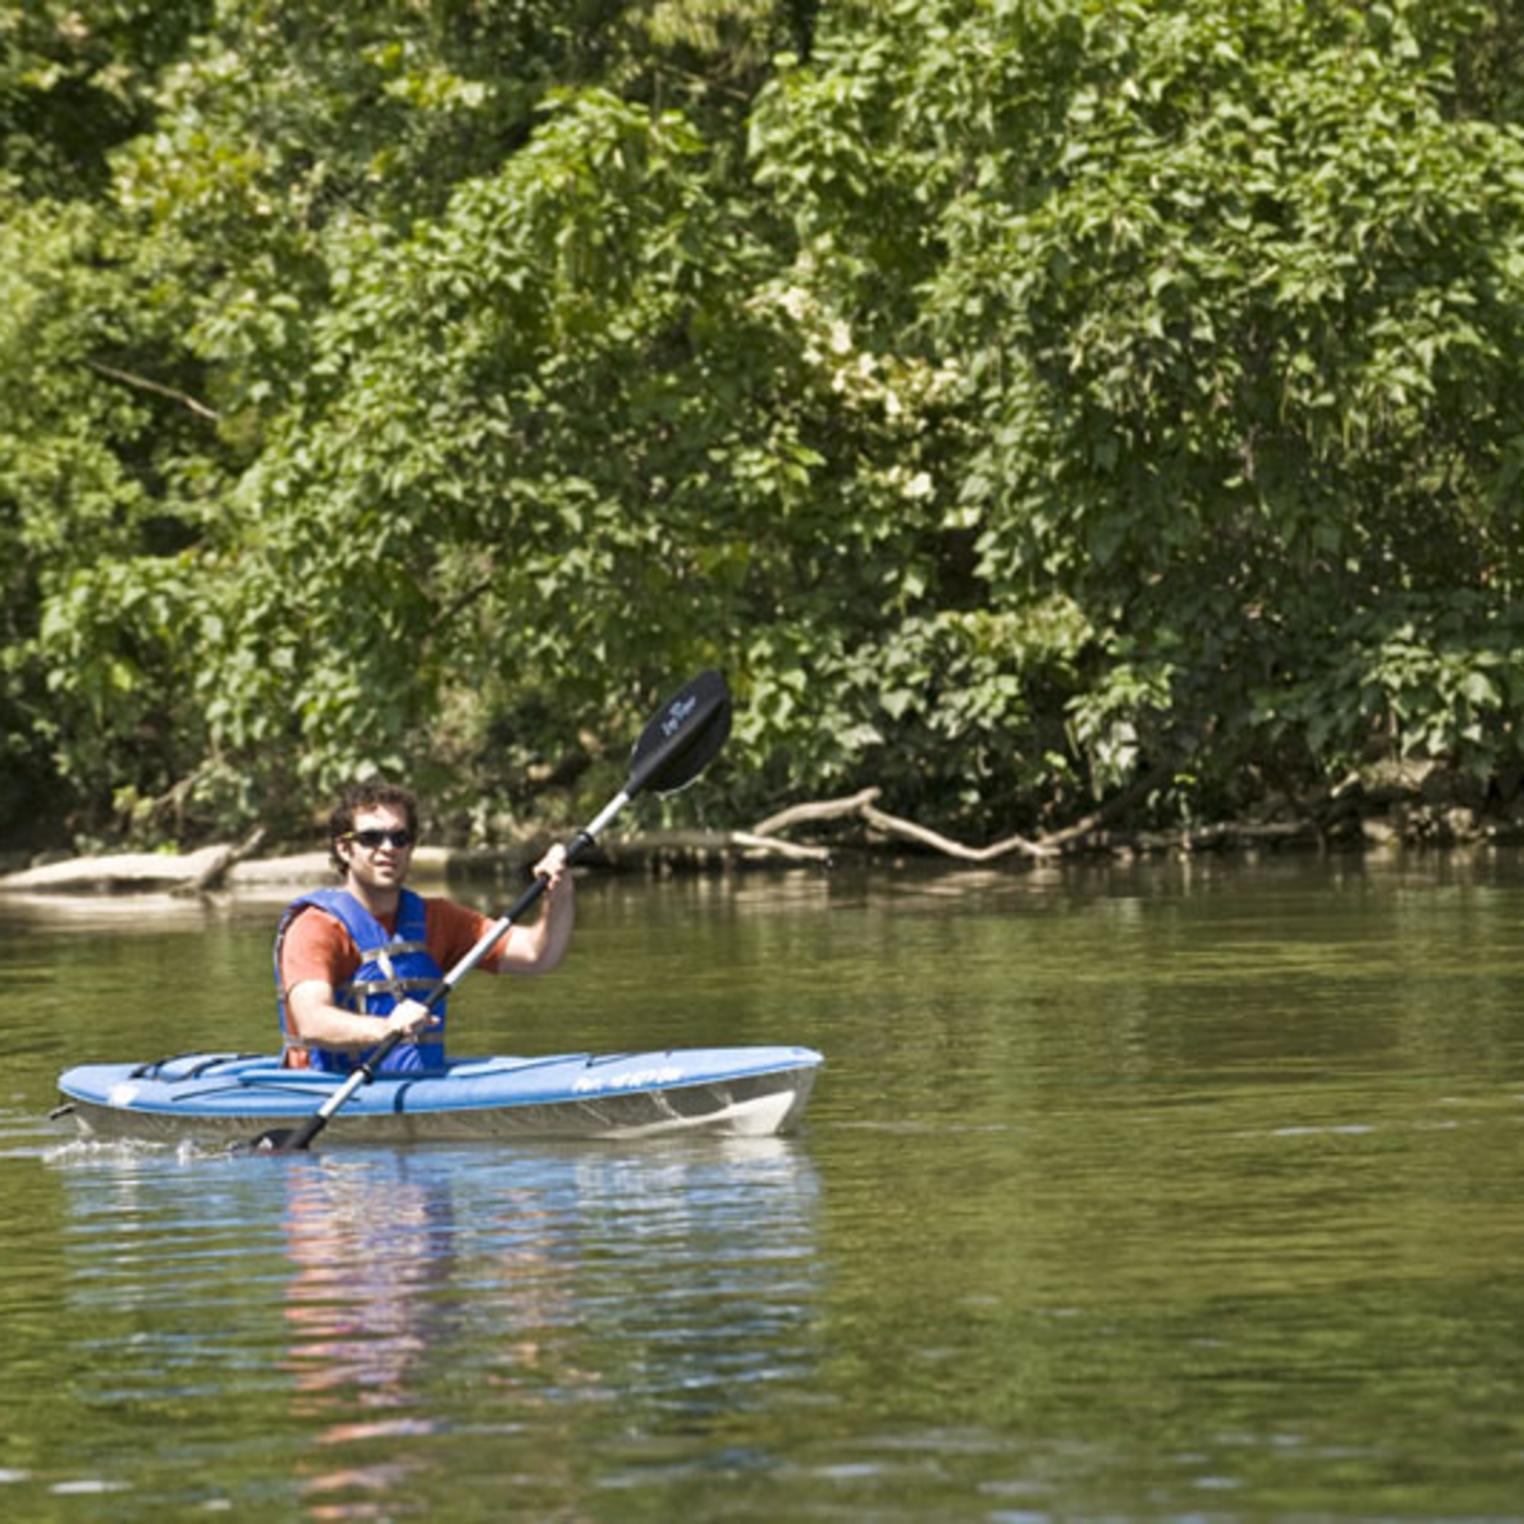 Kayaking on the Conodoguinet Creek